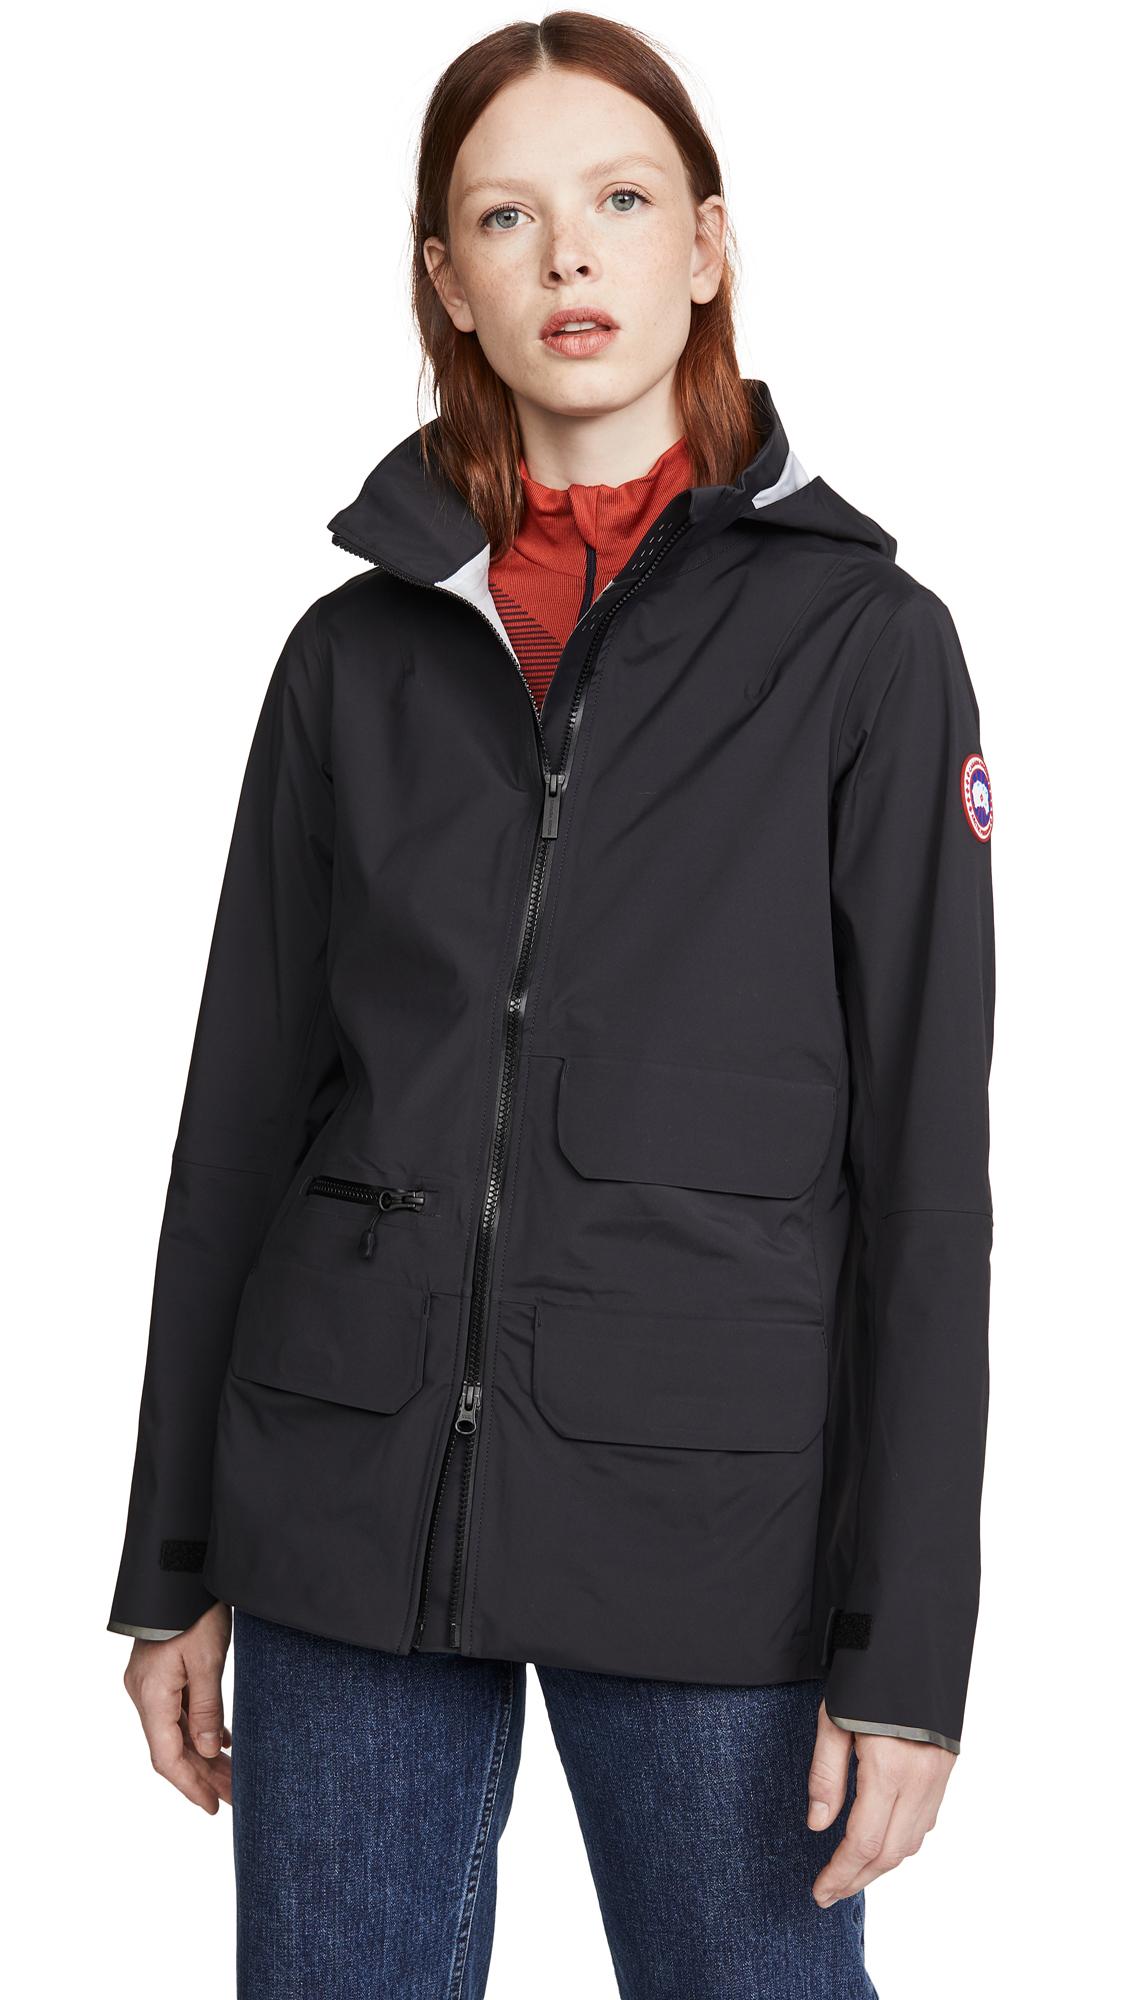 Buy Canada Goose Pacifica Jacket online beautiful Canada Goose Jackets, Coats, Trench Coats